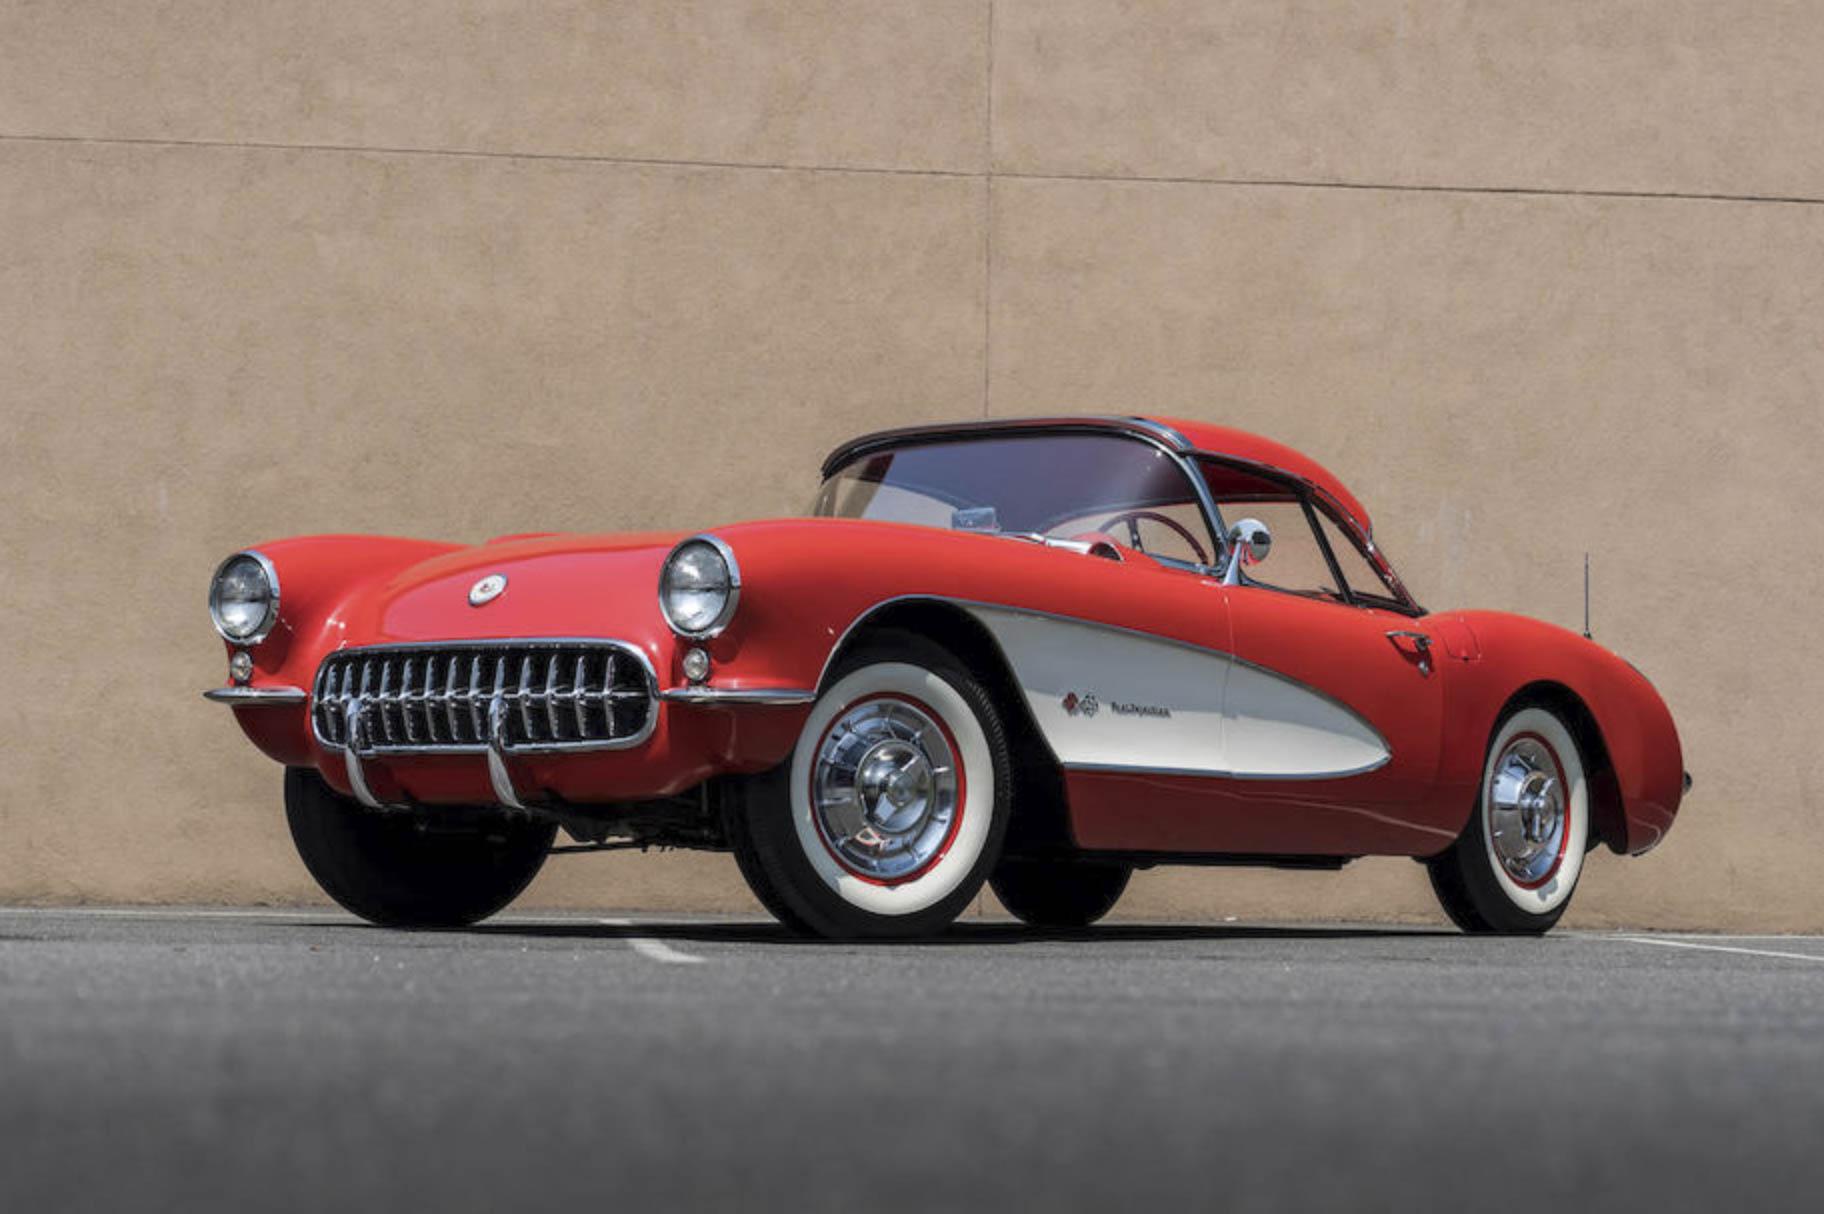 1957 Chevrolet Corvette Fuelie Roadster